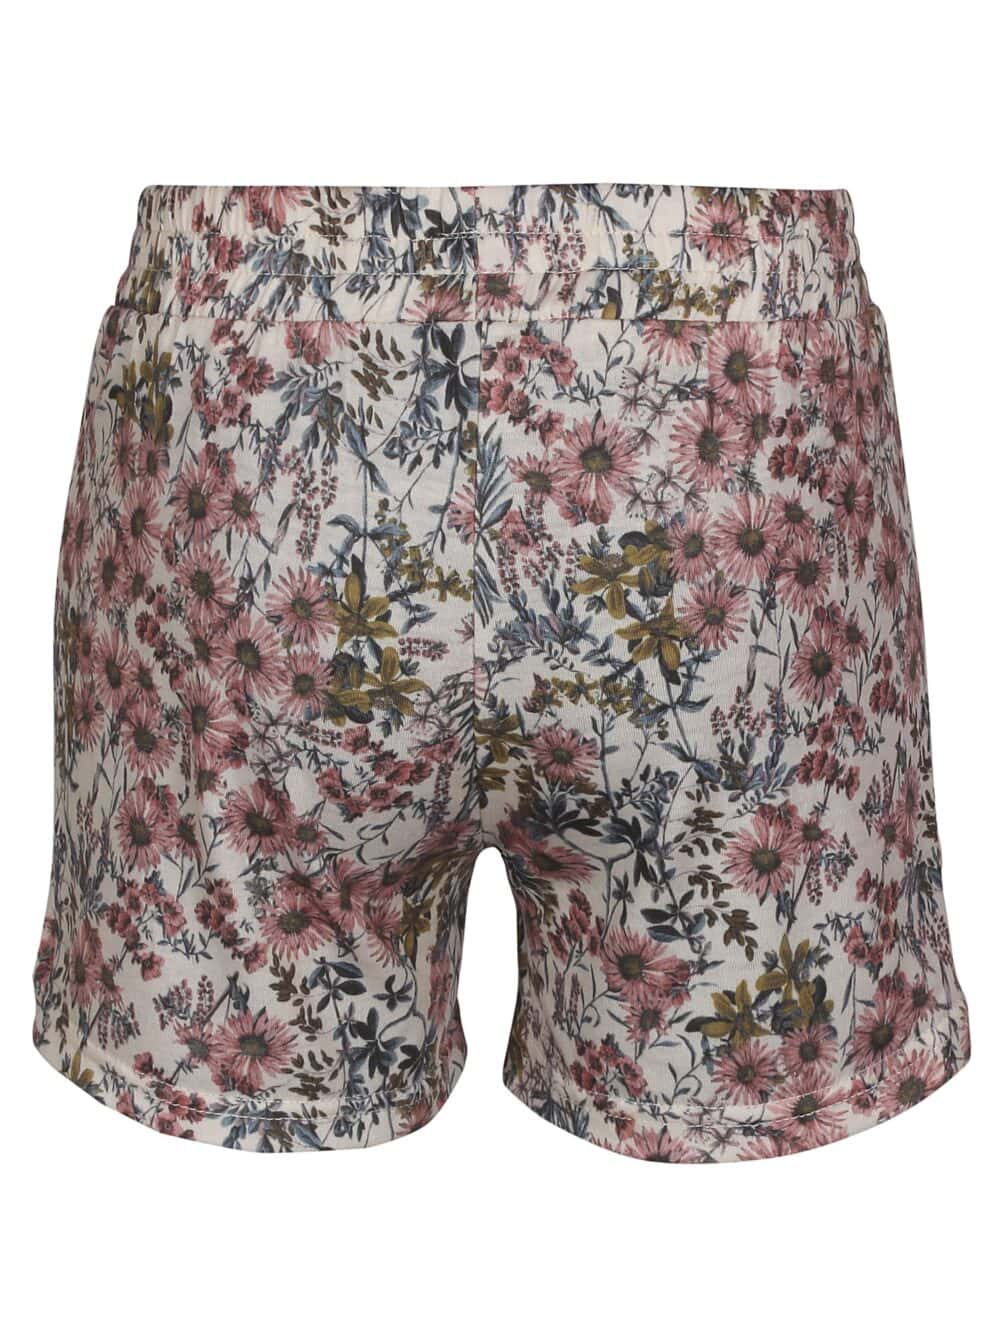 Kids Up Elissa 735 Shorts Sand